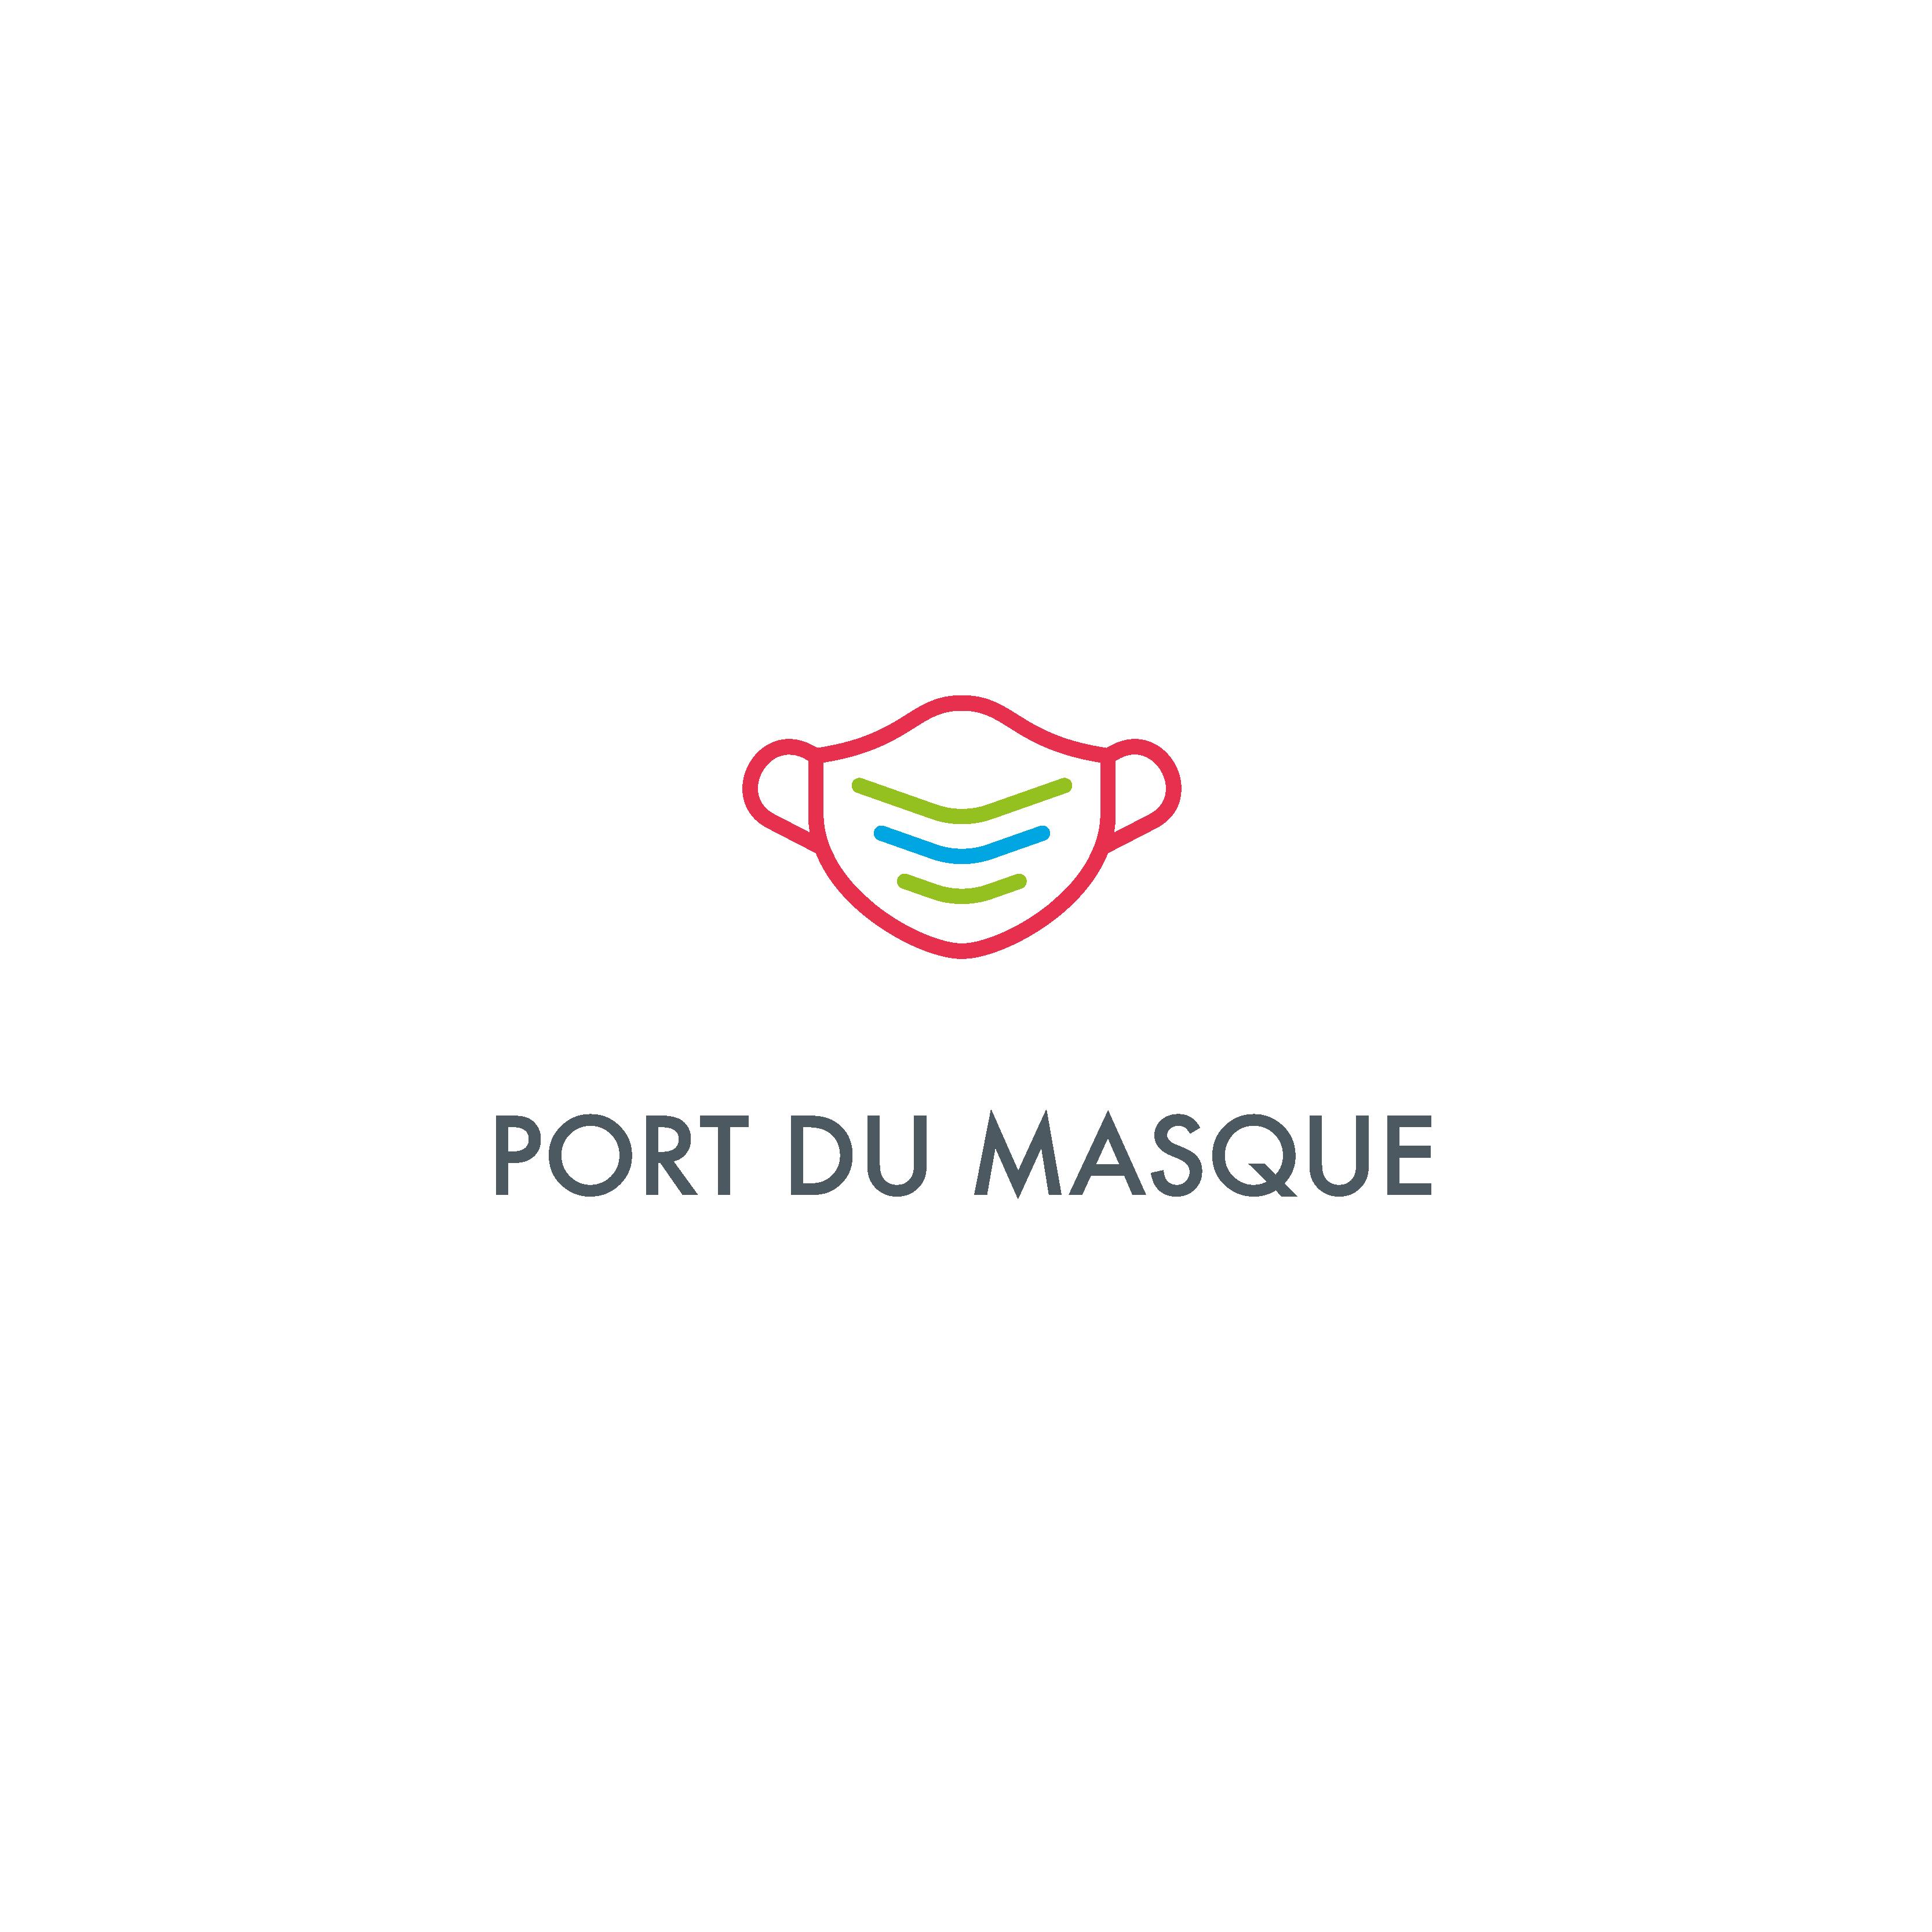 Port_du_masque